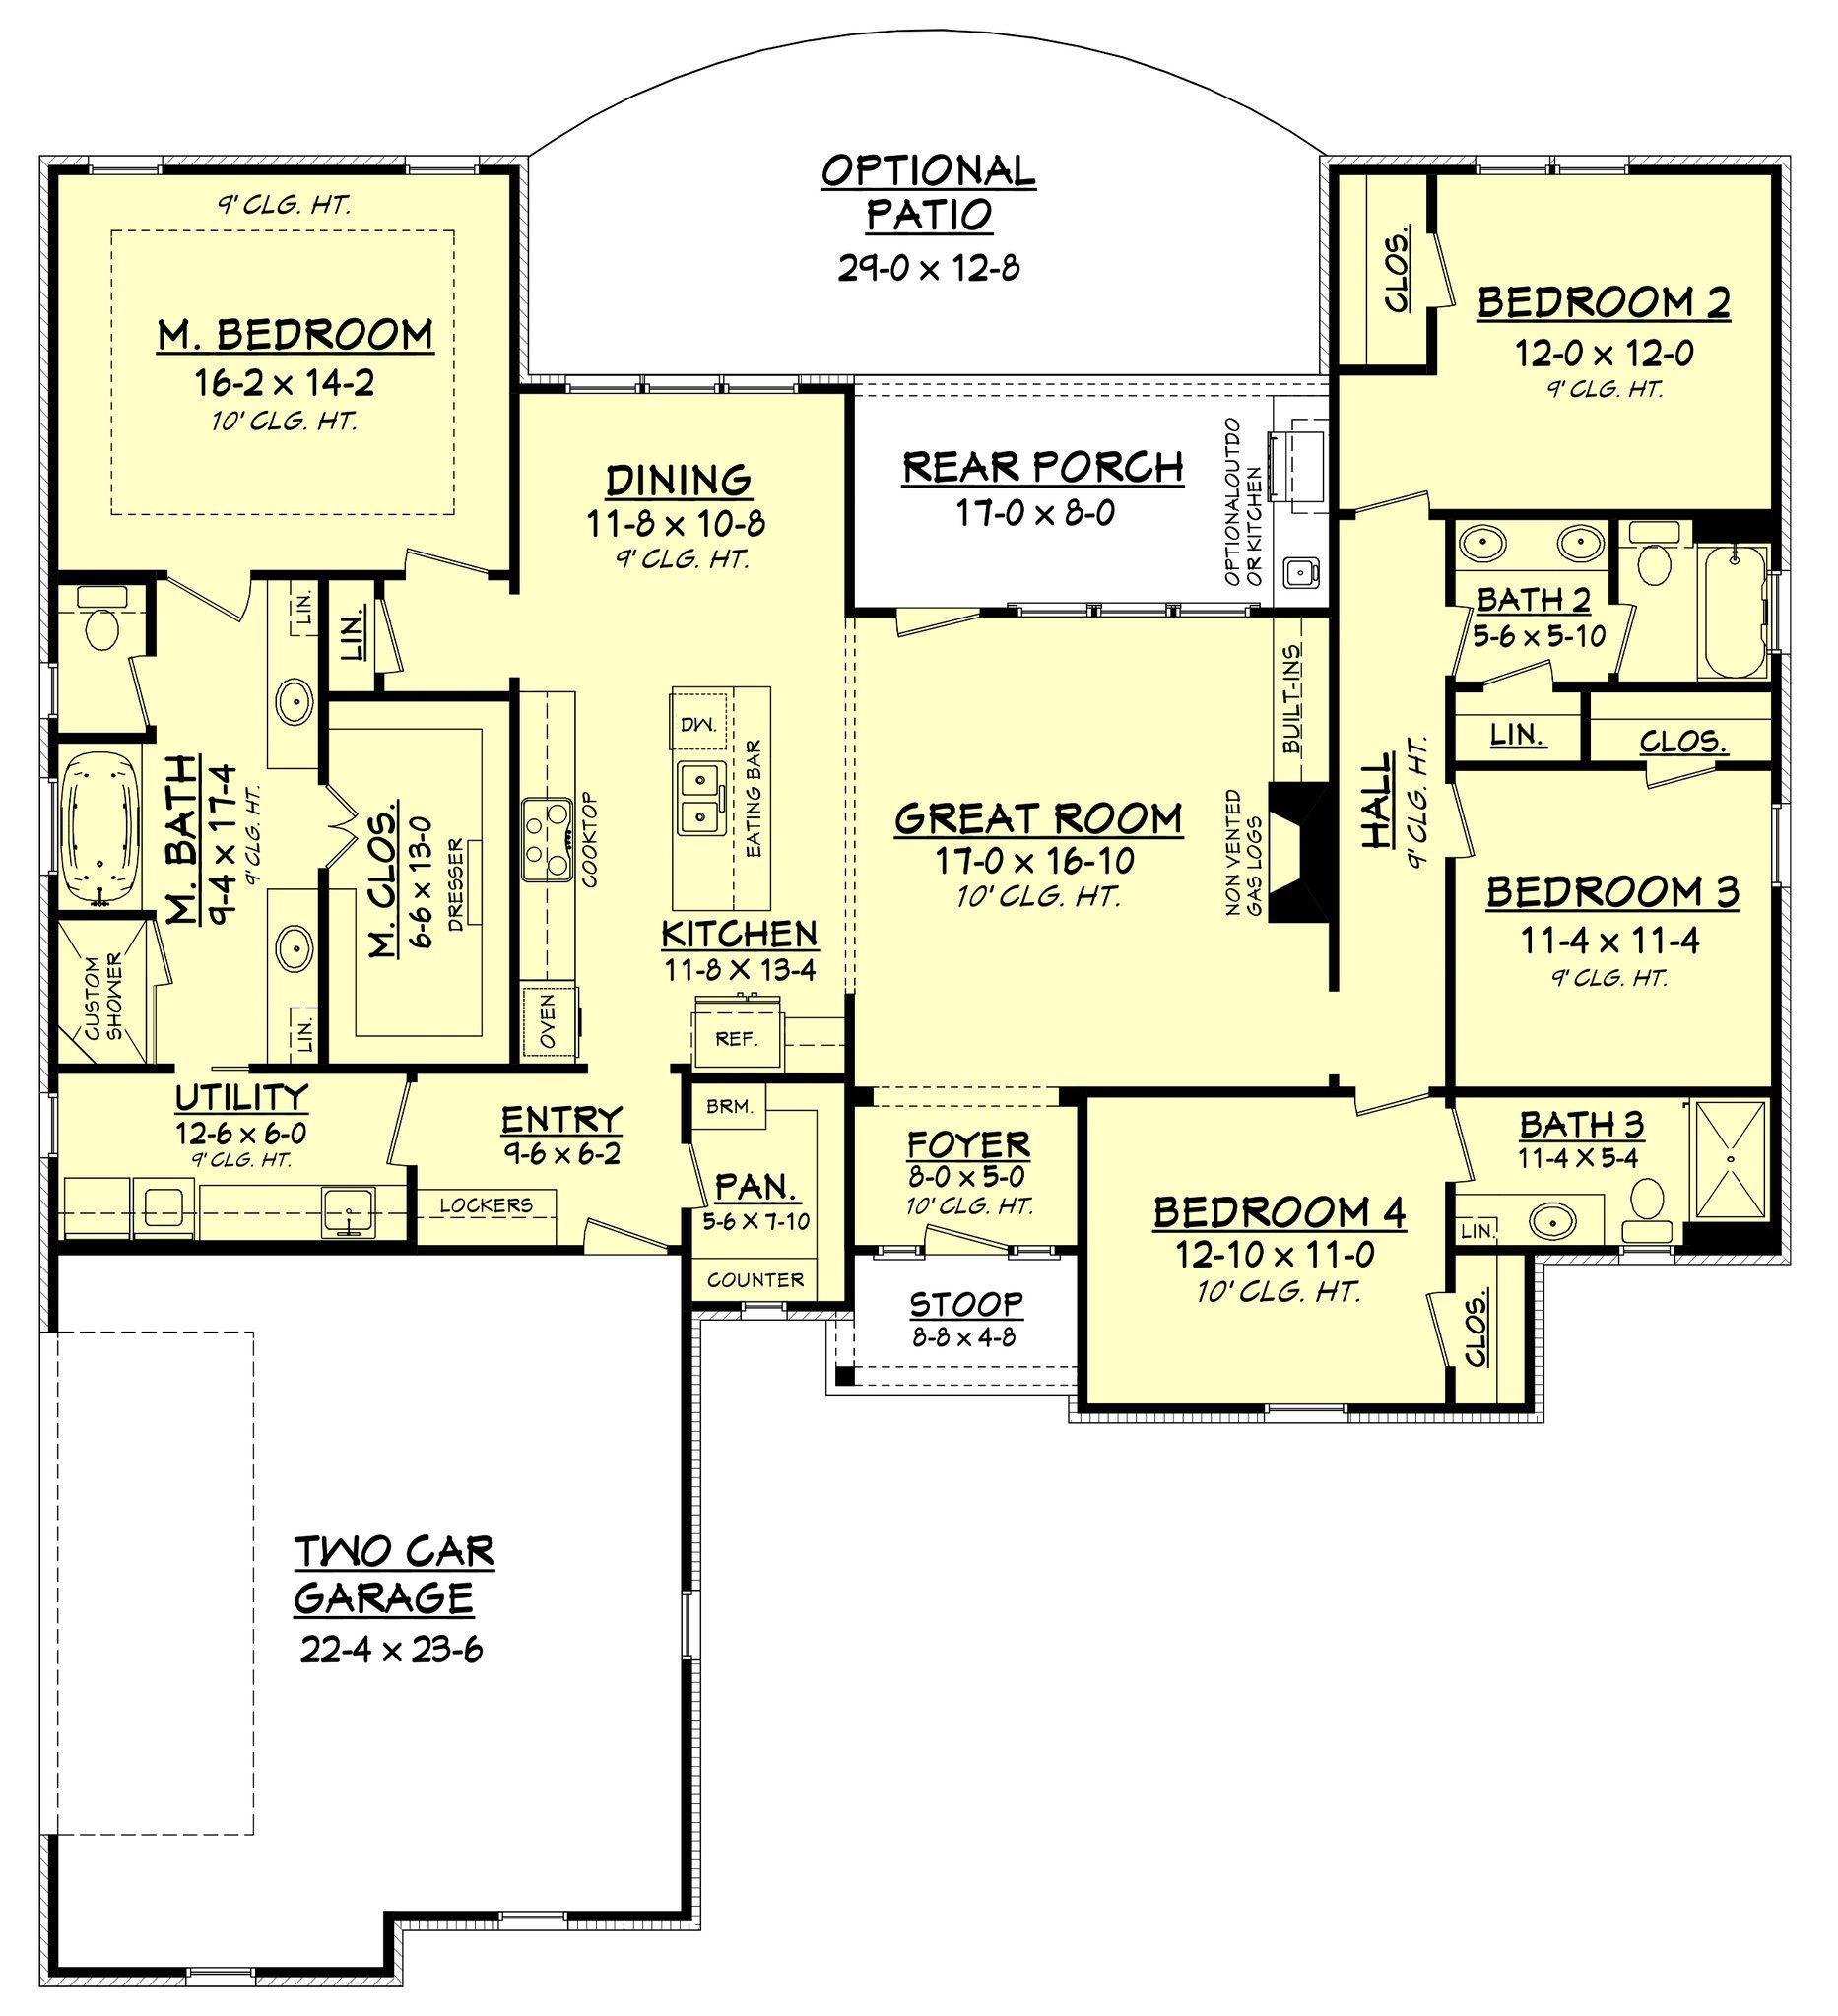 4 master bedroom house plans  Spruce House Plan  Carol BFF home  Pinterest  Full bath Vanities